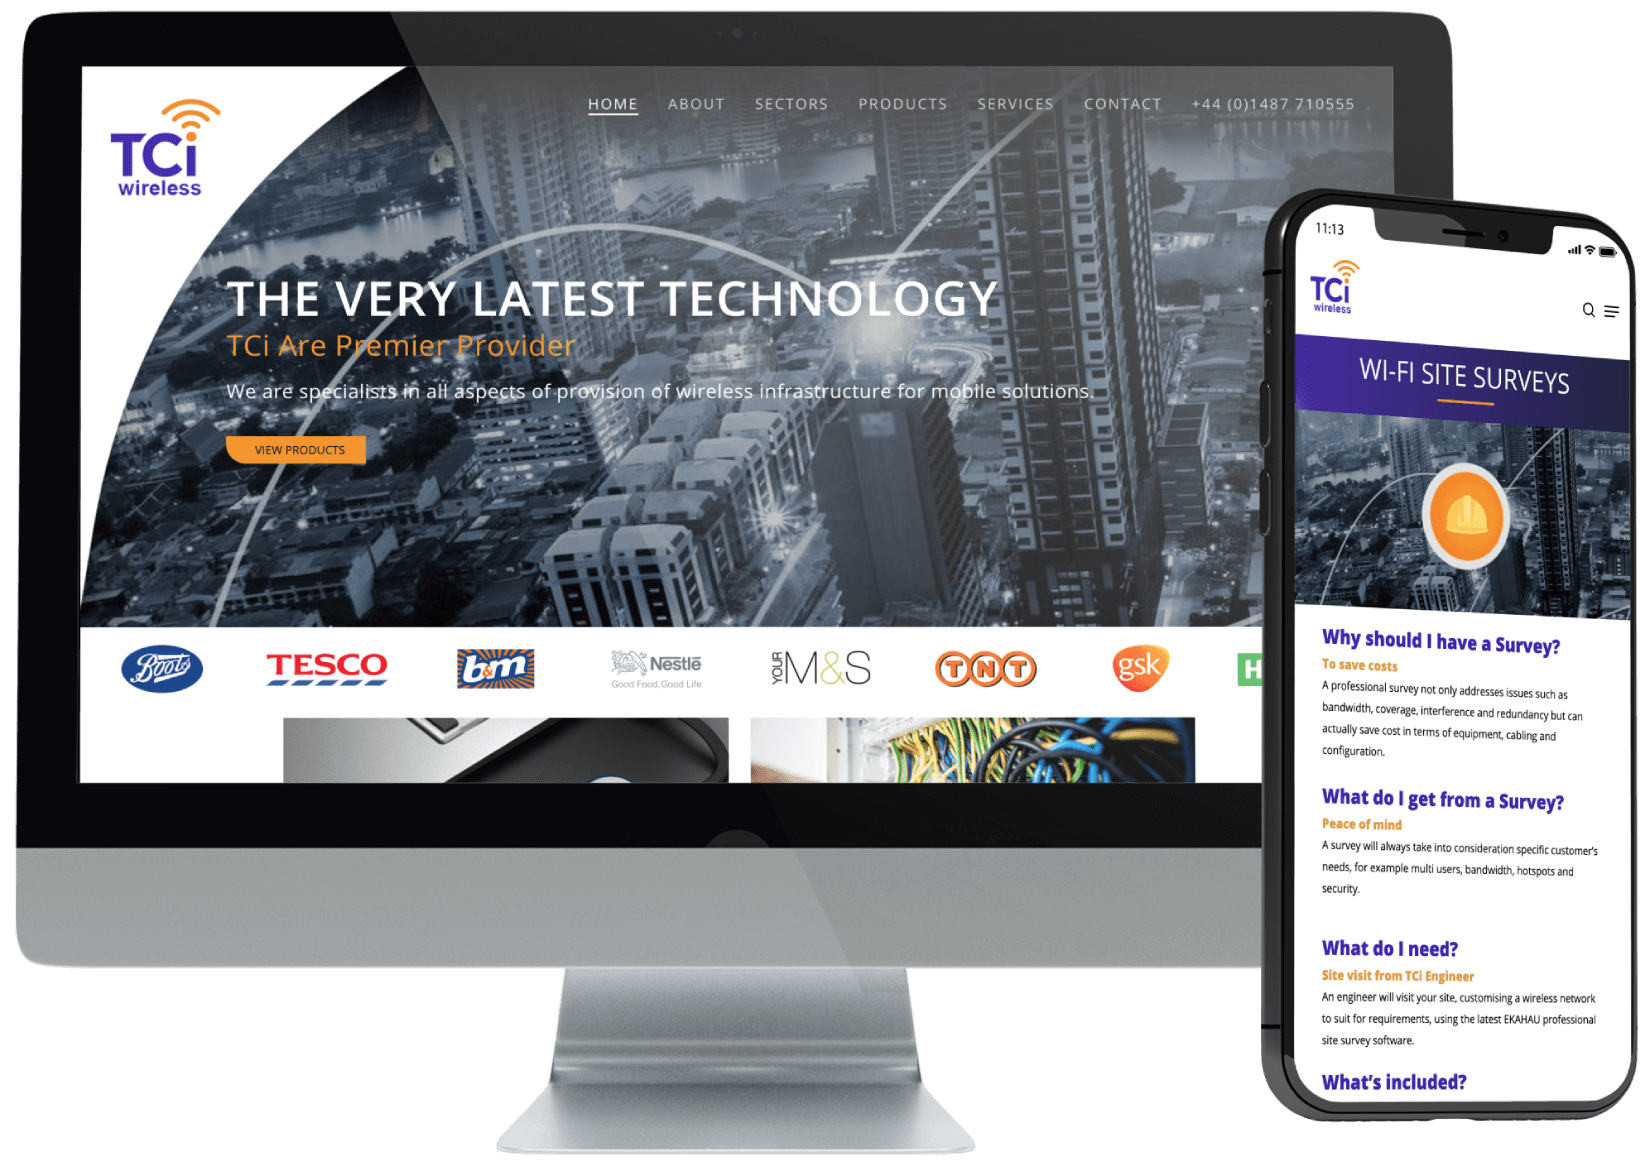 TCi Wireless Website Design